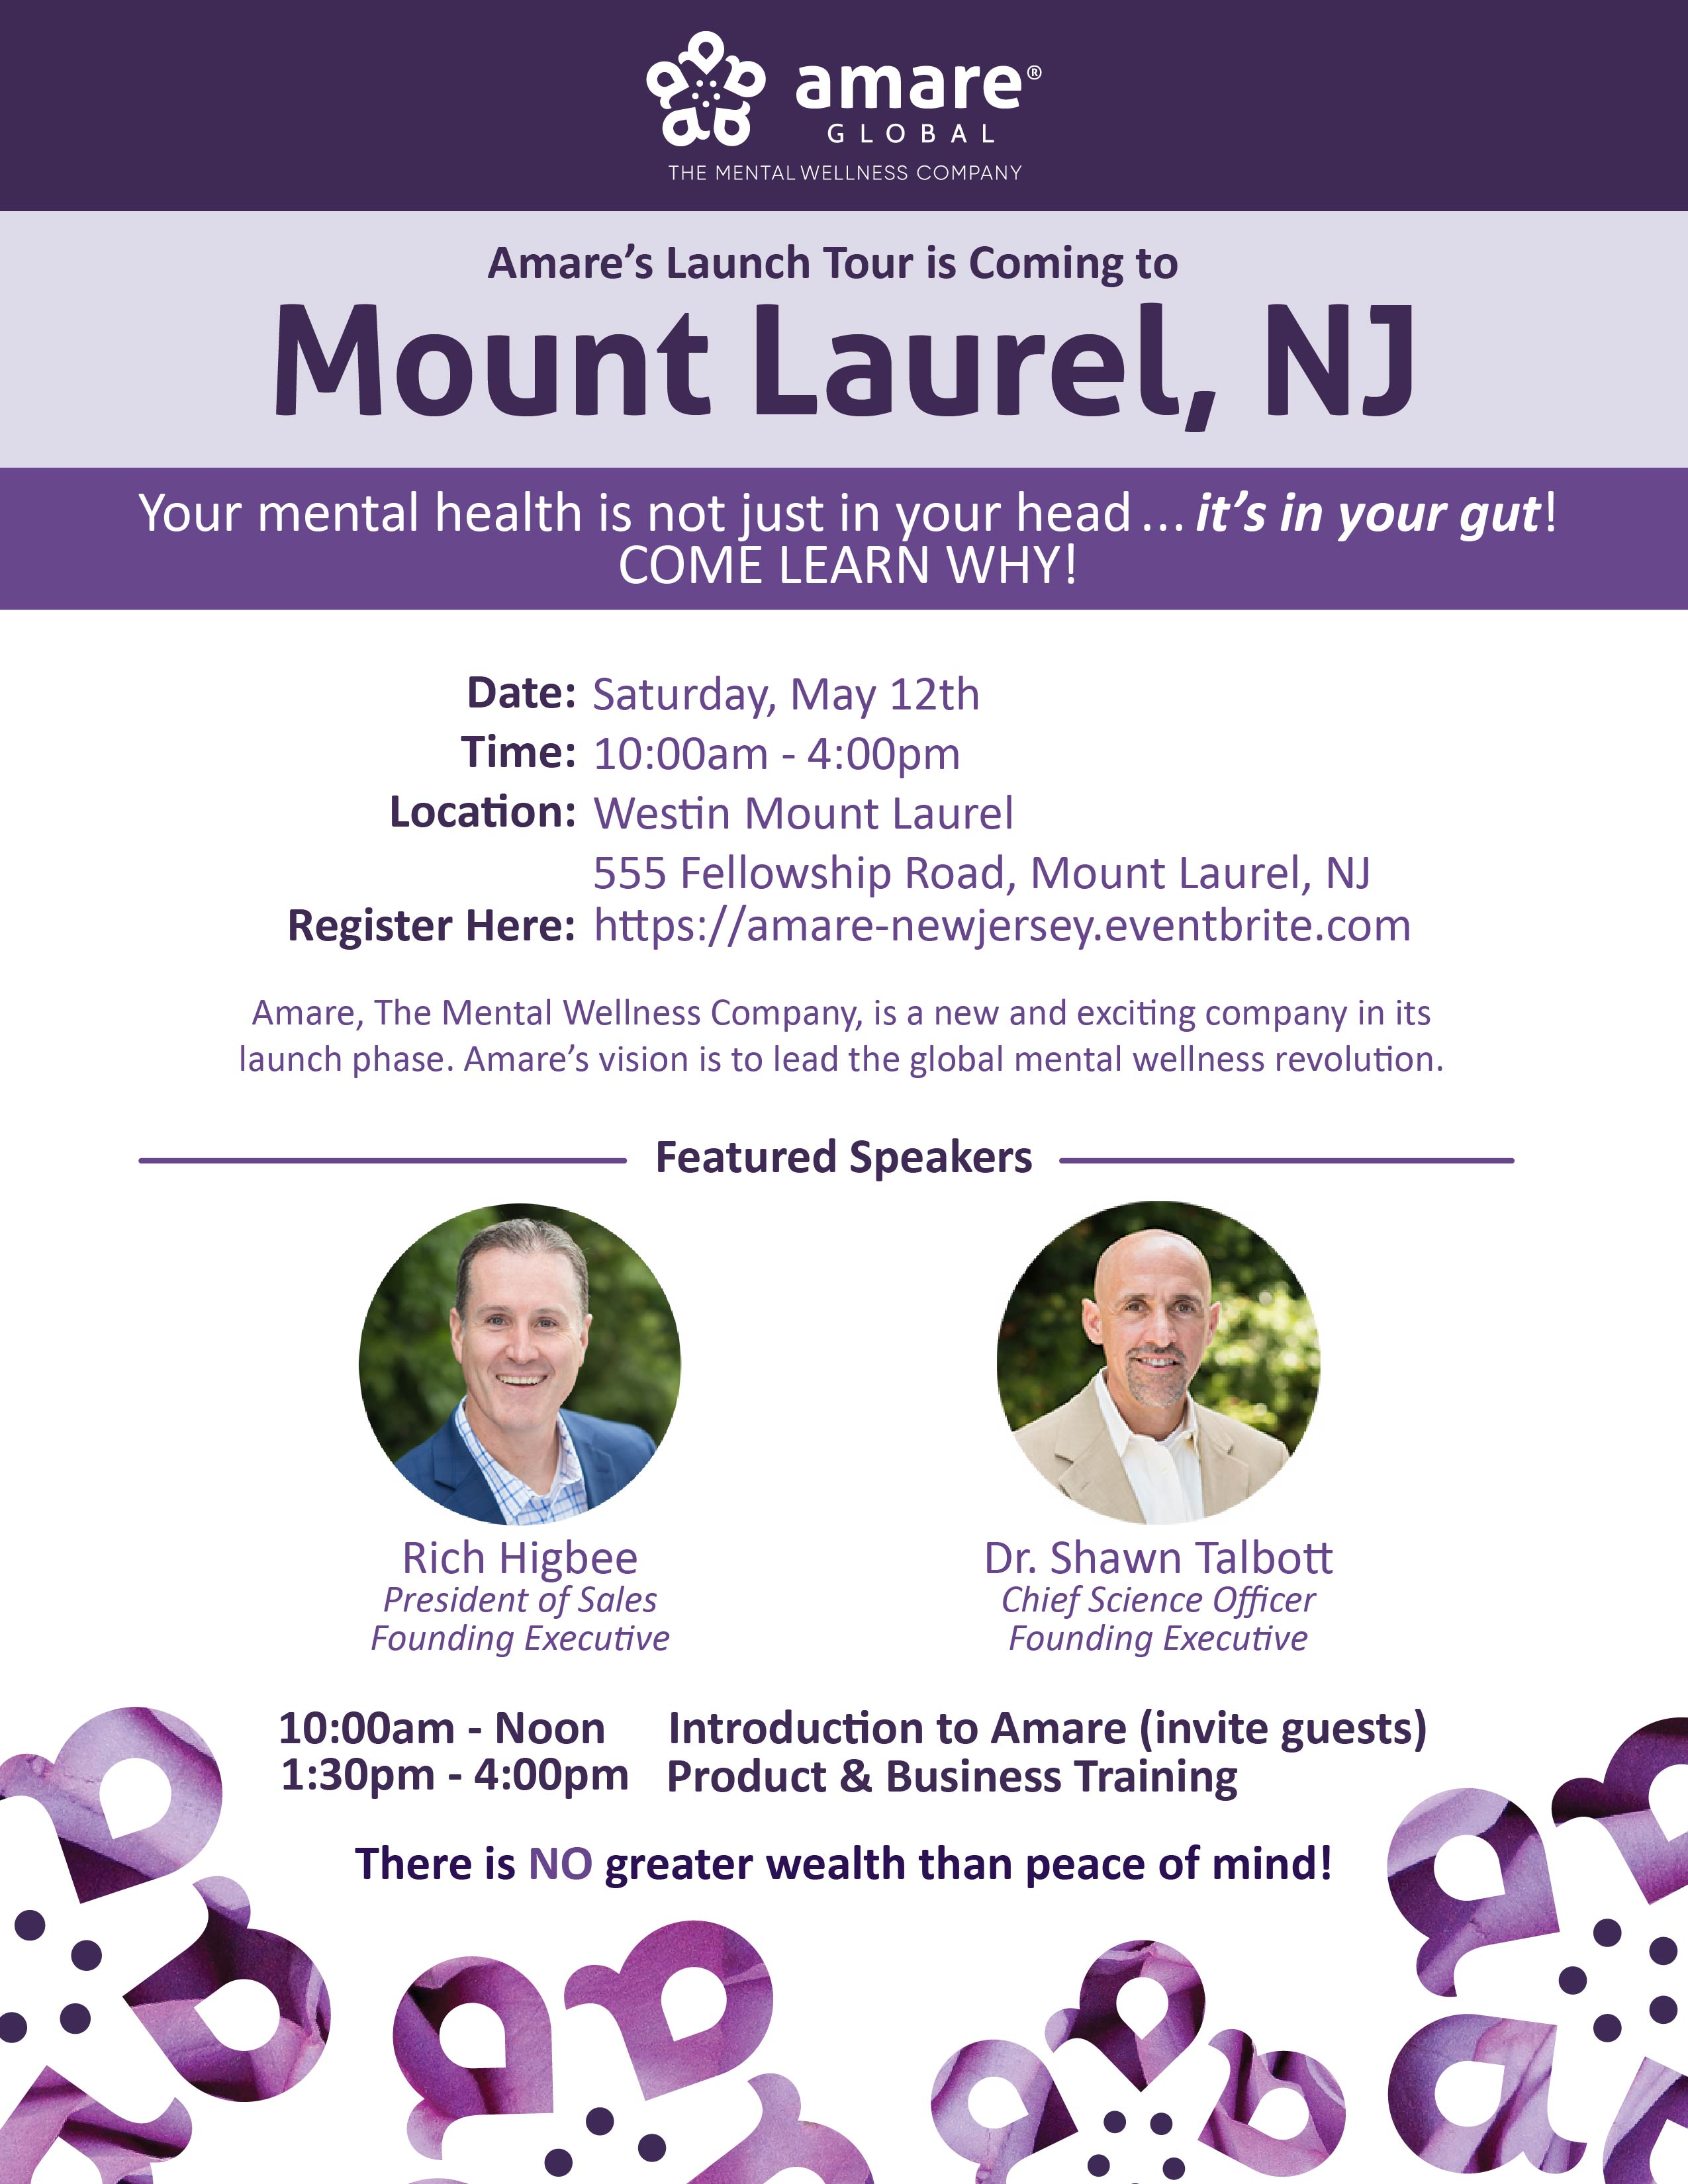 May 12th Mount Laurel, NJ Launch Tour Event